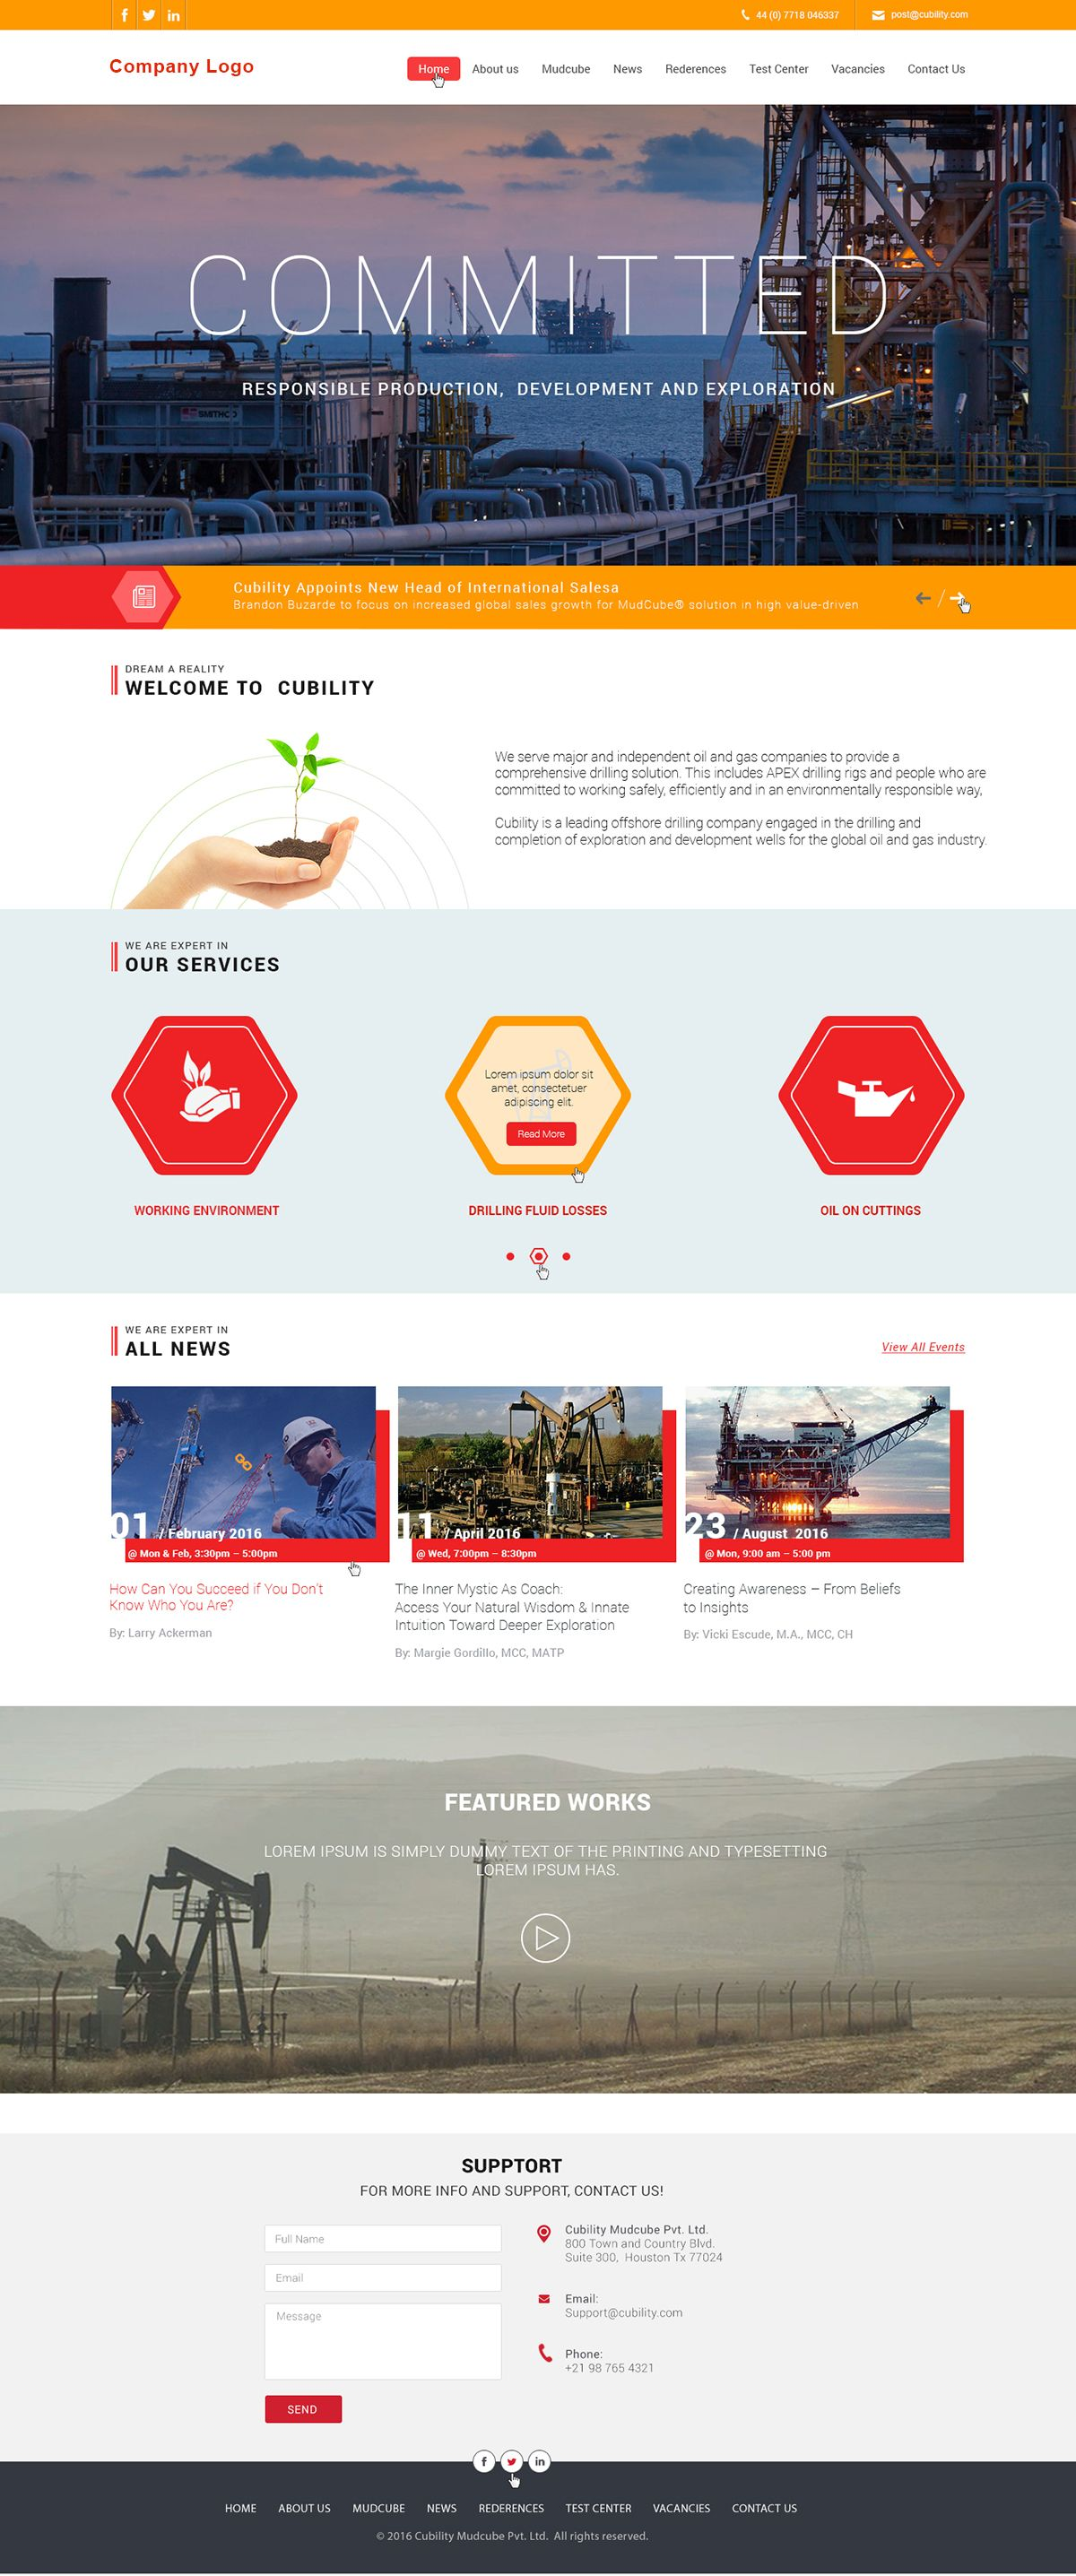 Industrial Website Templates This Customizable Industrial Website Templates Can Be Used For Any Sma Portfolio Web Design Website Template Web Layout Design